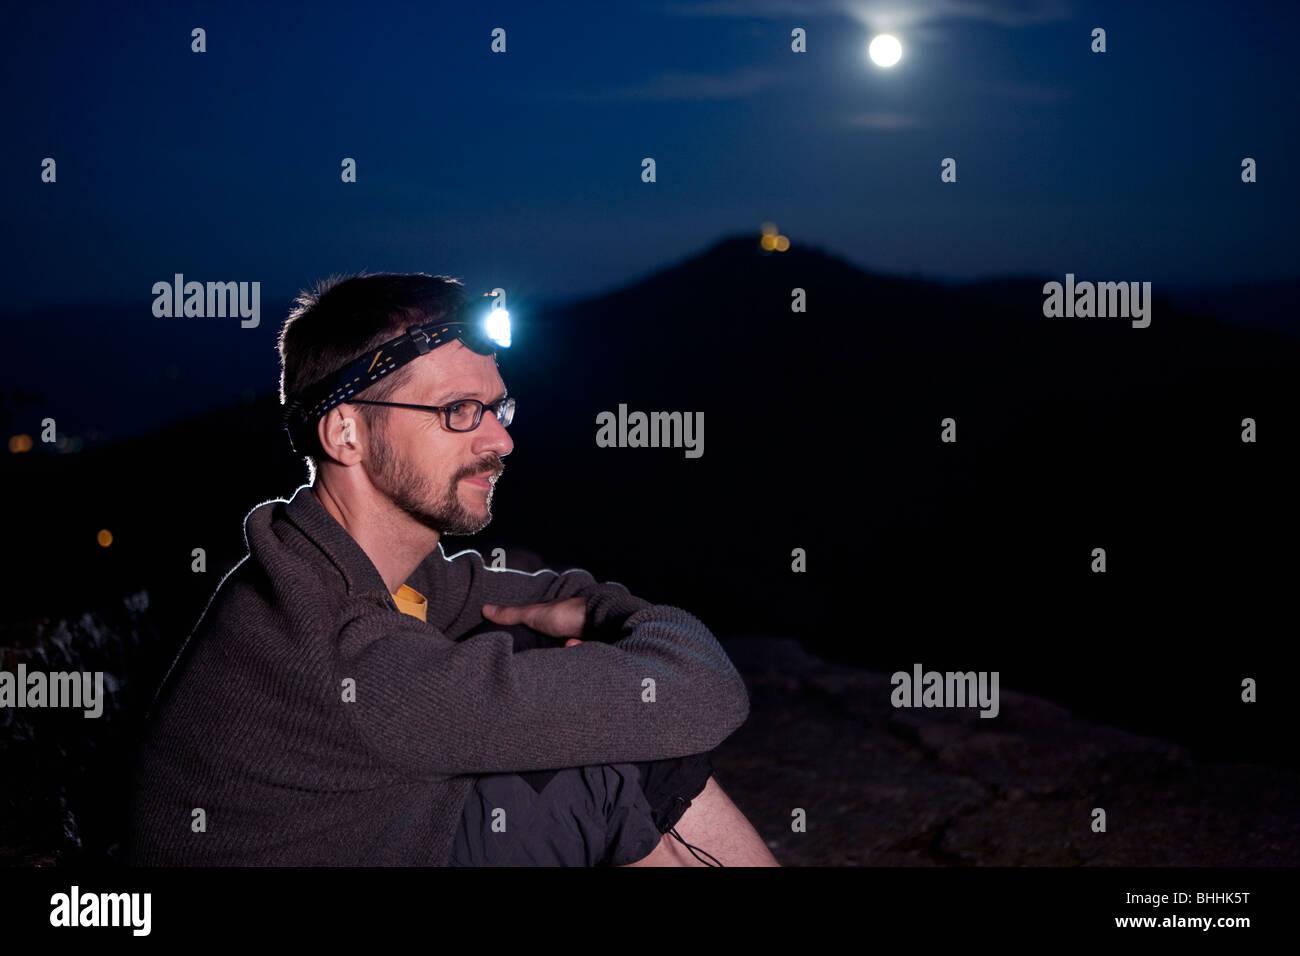 Sitting rock climber wearing headlamp on Battert Rocks near Baden-Baden at night, Baden-Wuerttemberg, Germany - Stock Image